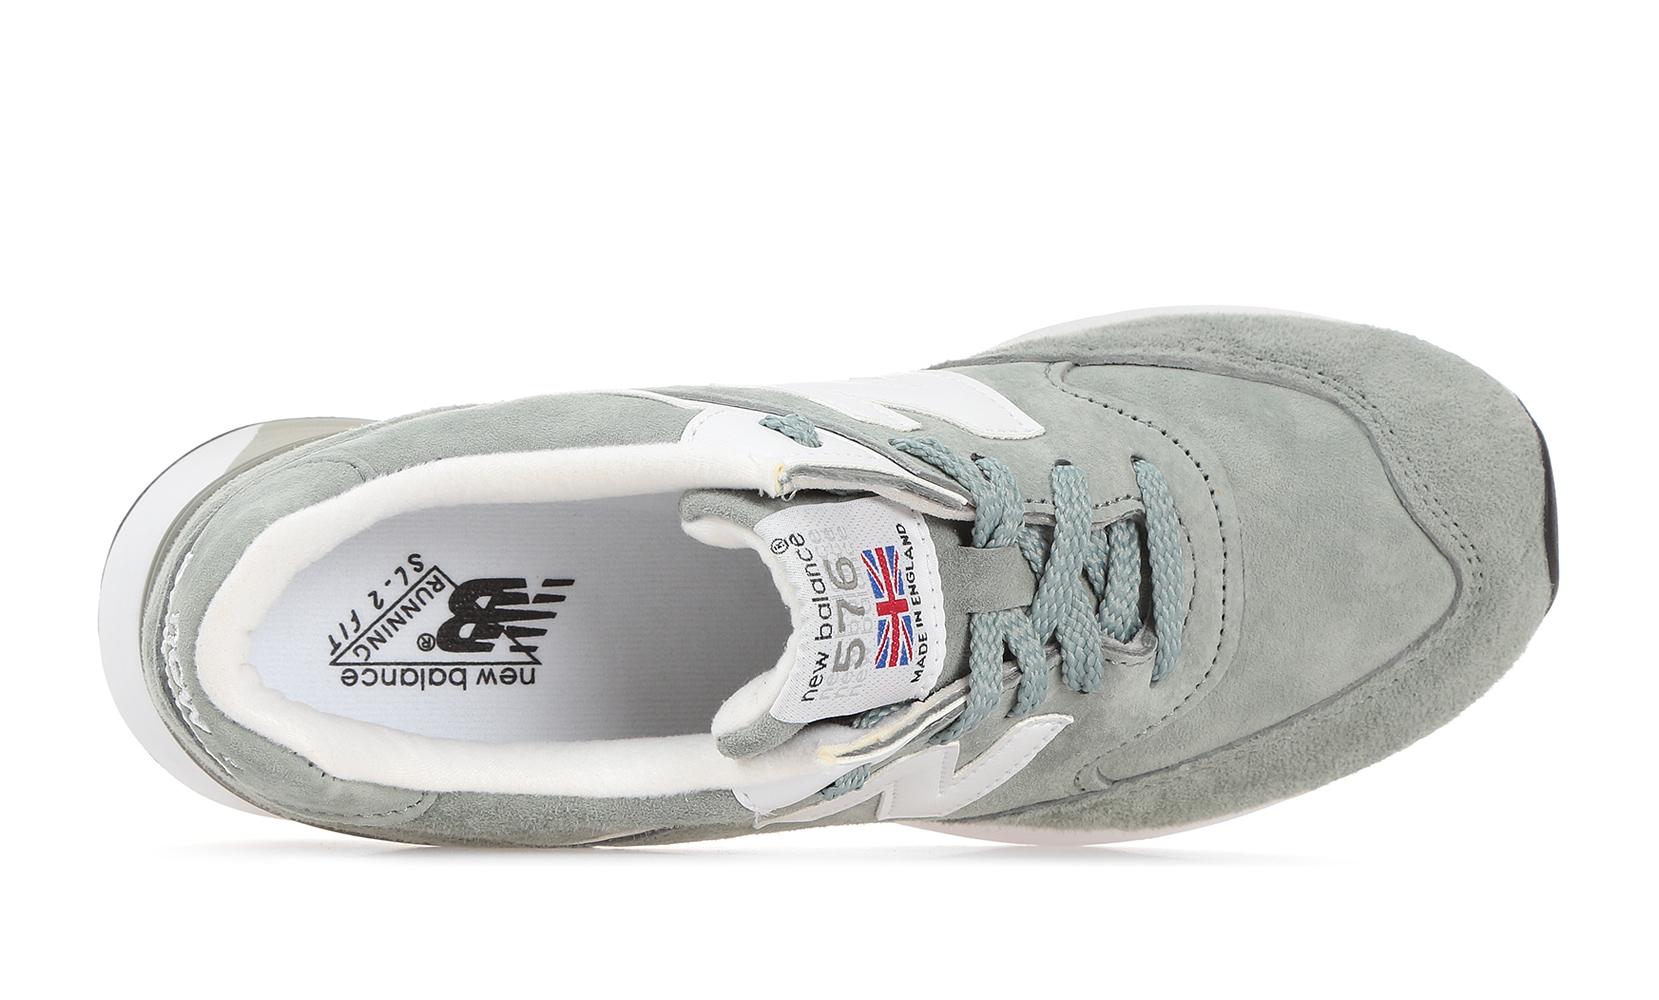 Жіноче взуття повсякденне  New Balance 576  Made in UK W576PG | New Balance